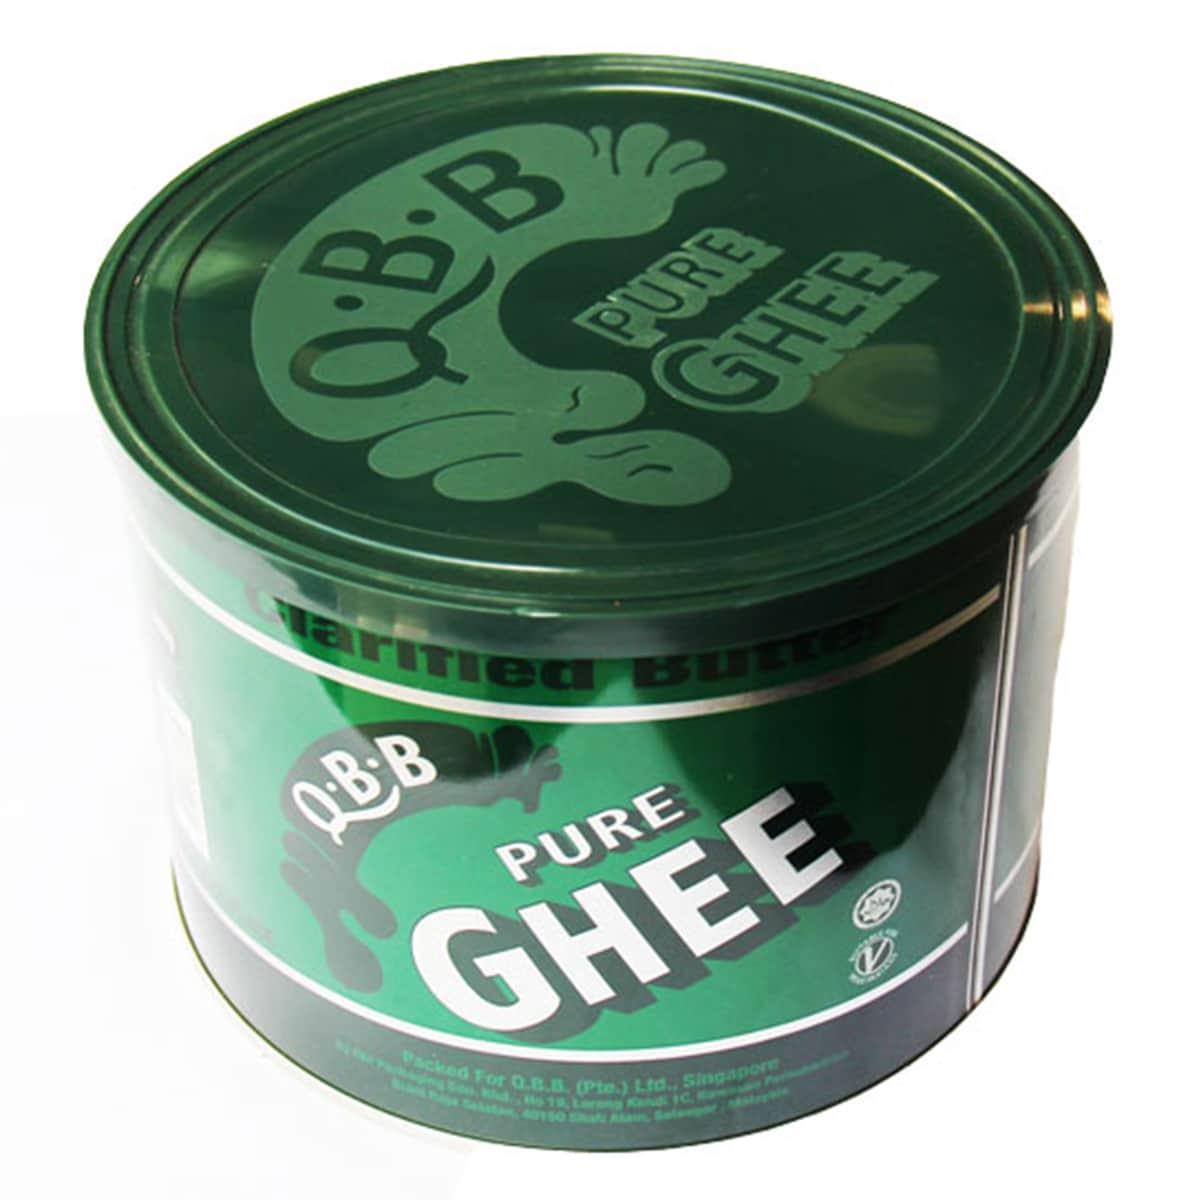 Buy QBB Pure Ghee (Clarified Butter) - 400 gm